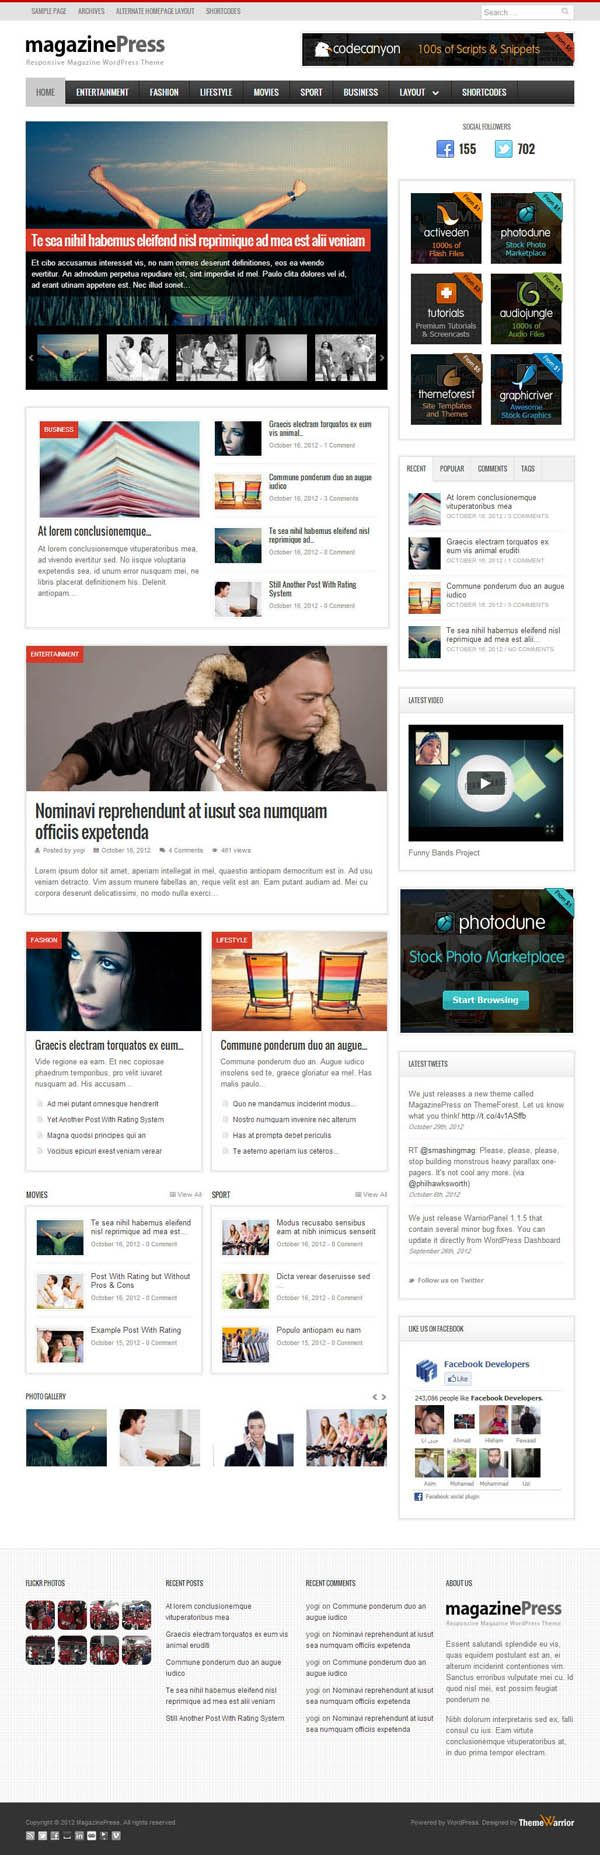 Responsive Wordpress Themes Other Inspiring Websites Pinterest